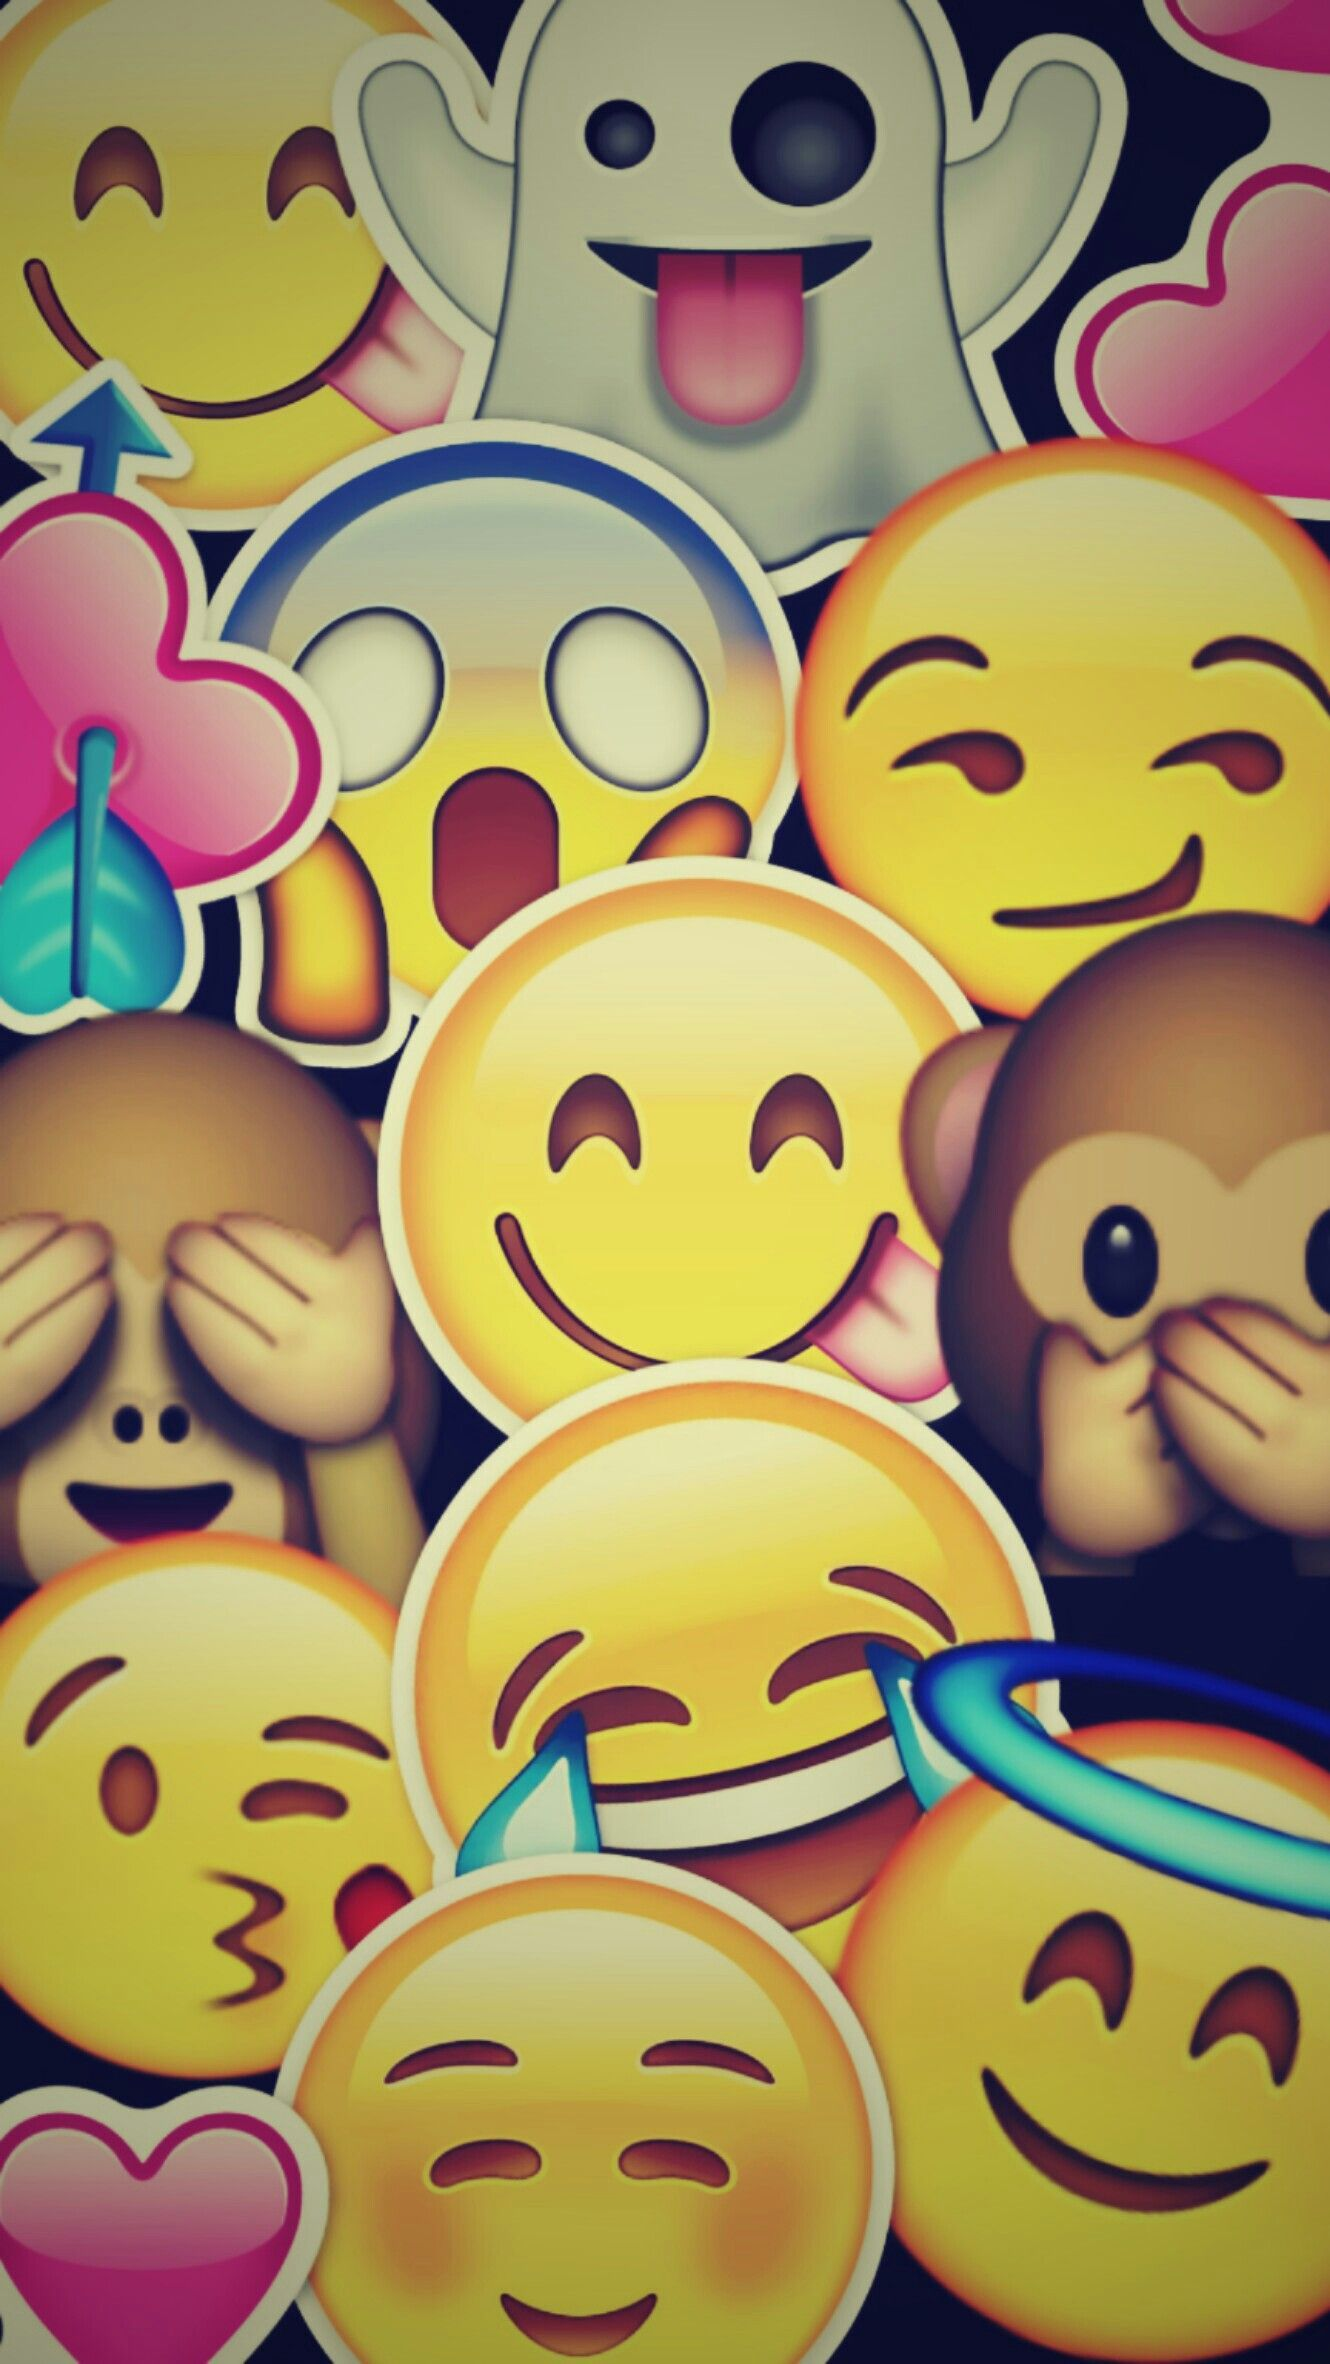 Emoji Background wallpaper iphone background